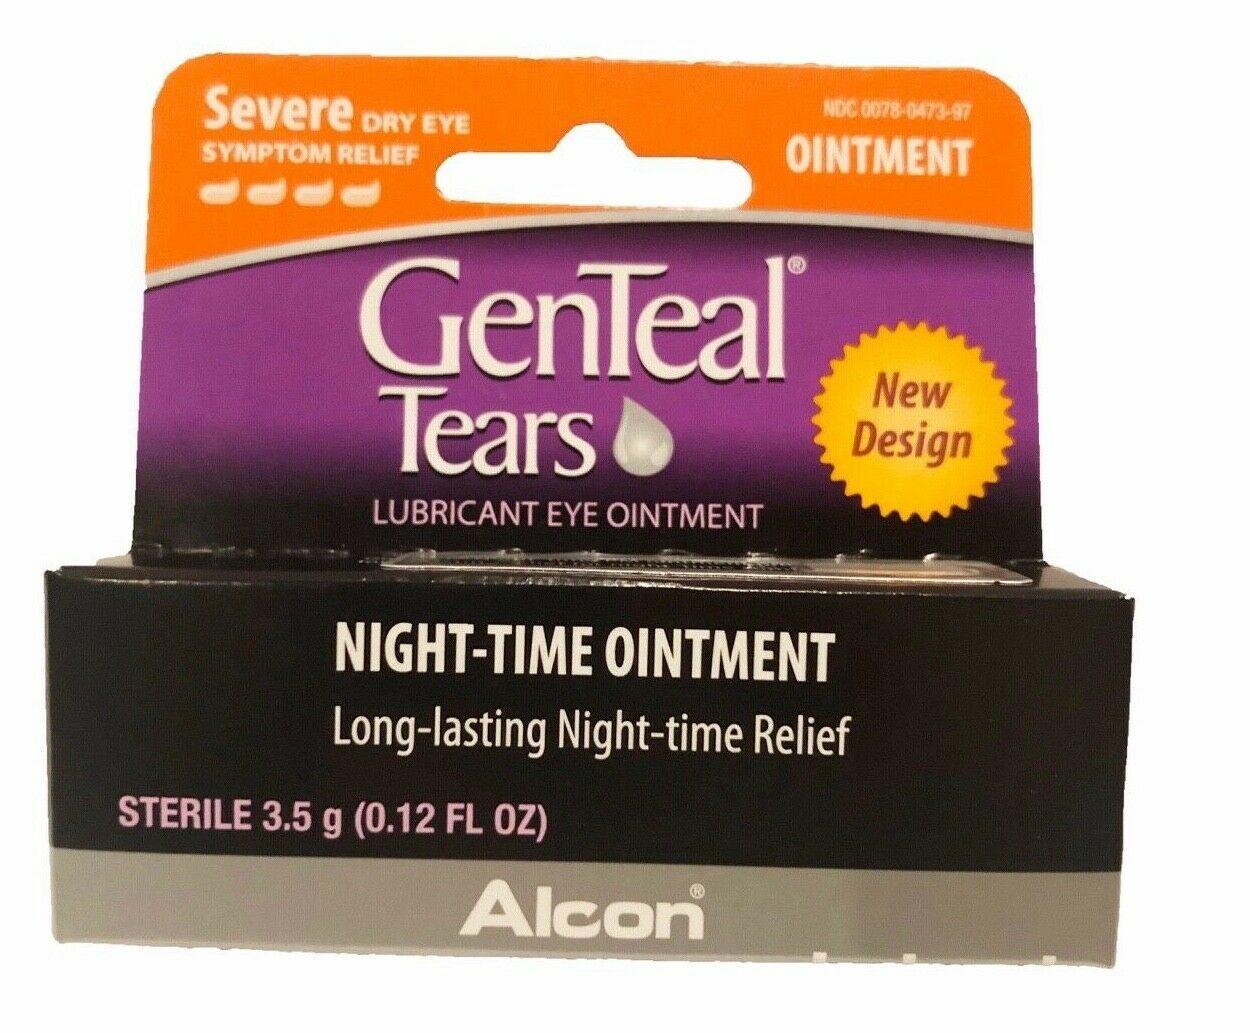 GENTEAL Tears Severe Eye Ointment for Severe Dry Eye Symptom Relief, 3.5g